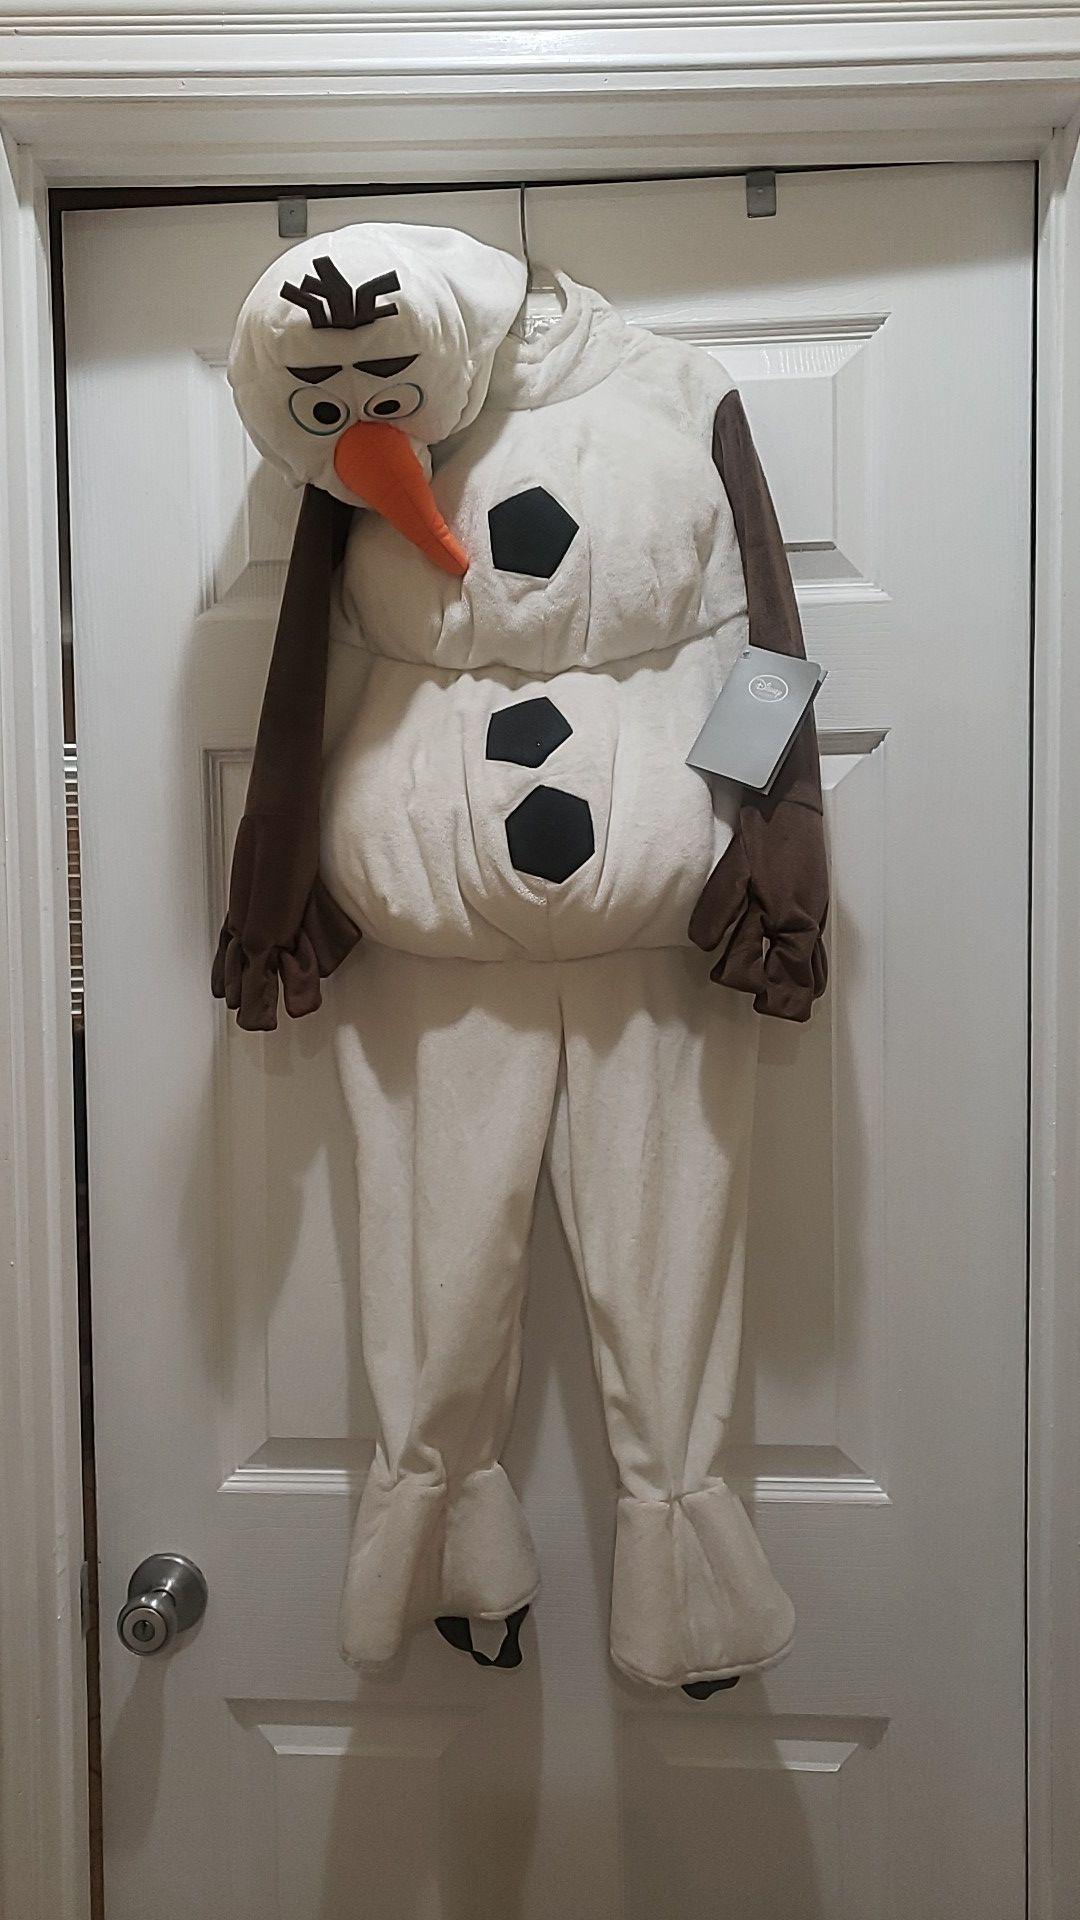 New original Frozen Olaf costume